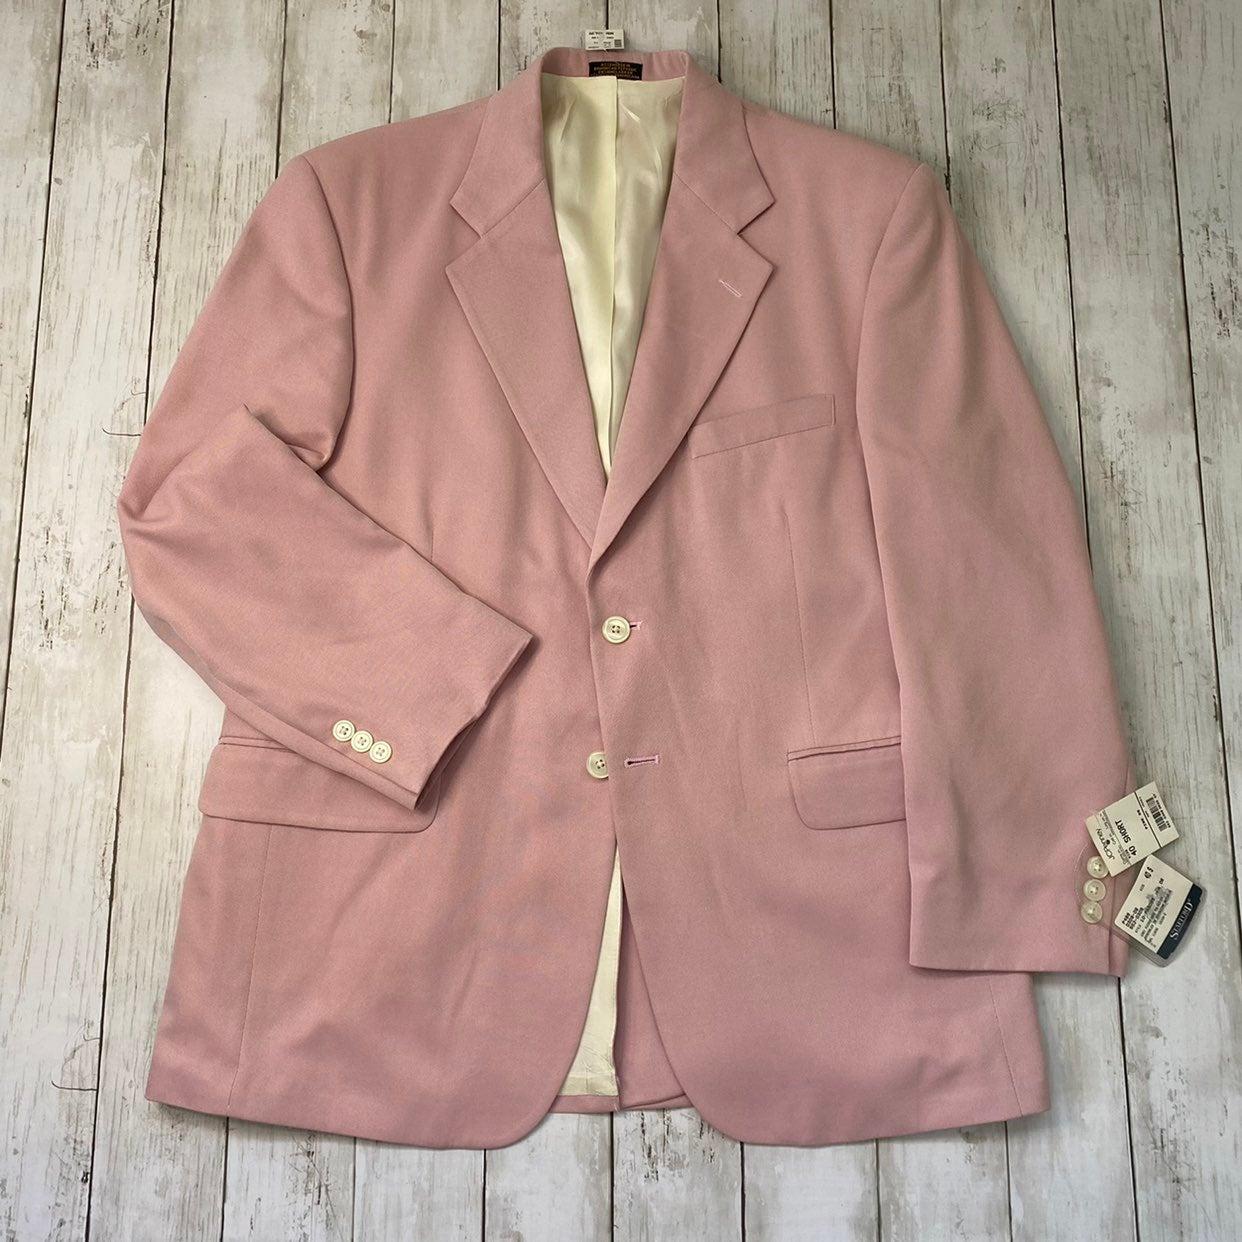 Vintage mens blazer